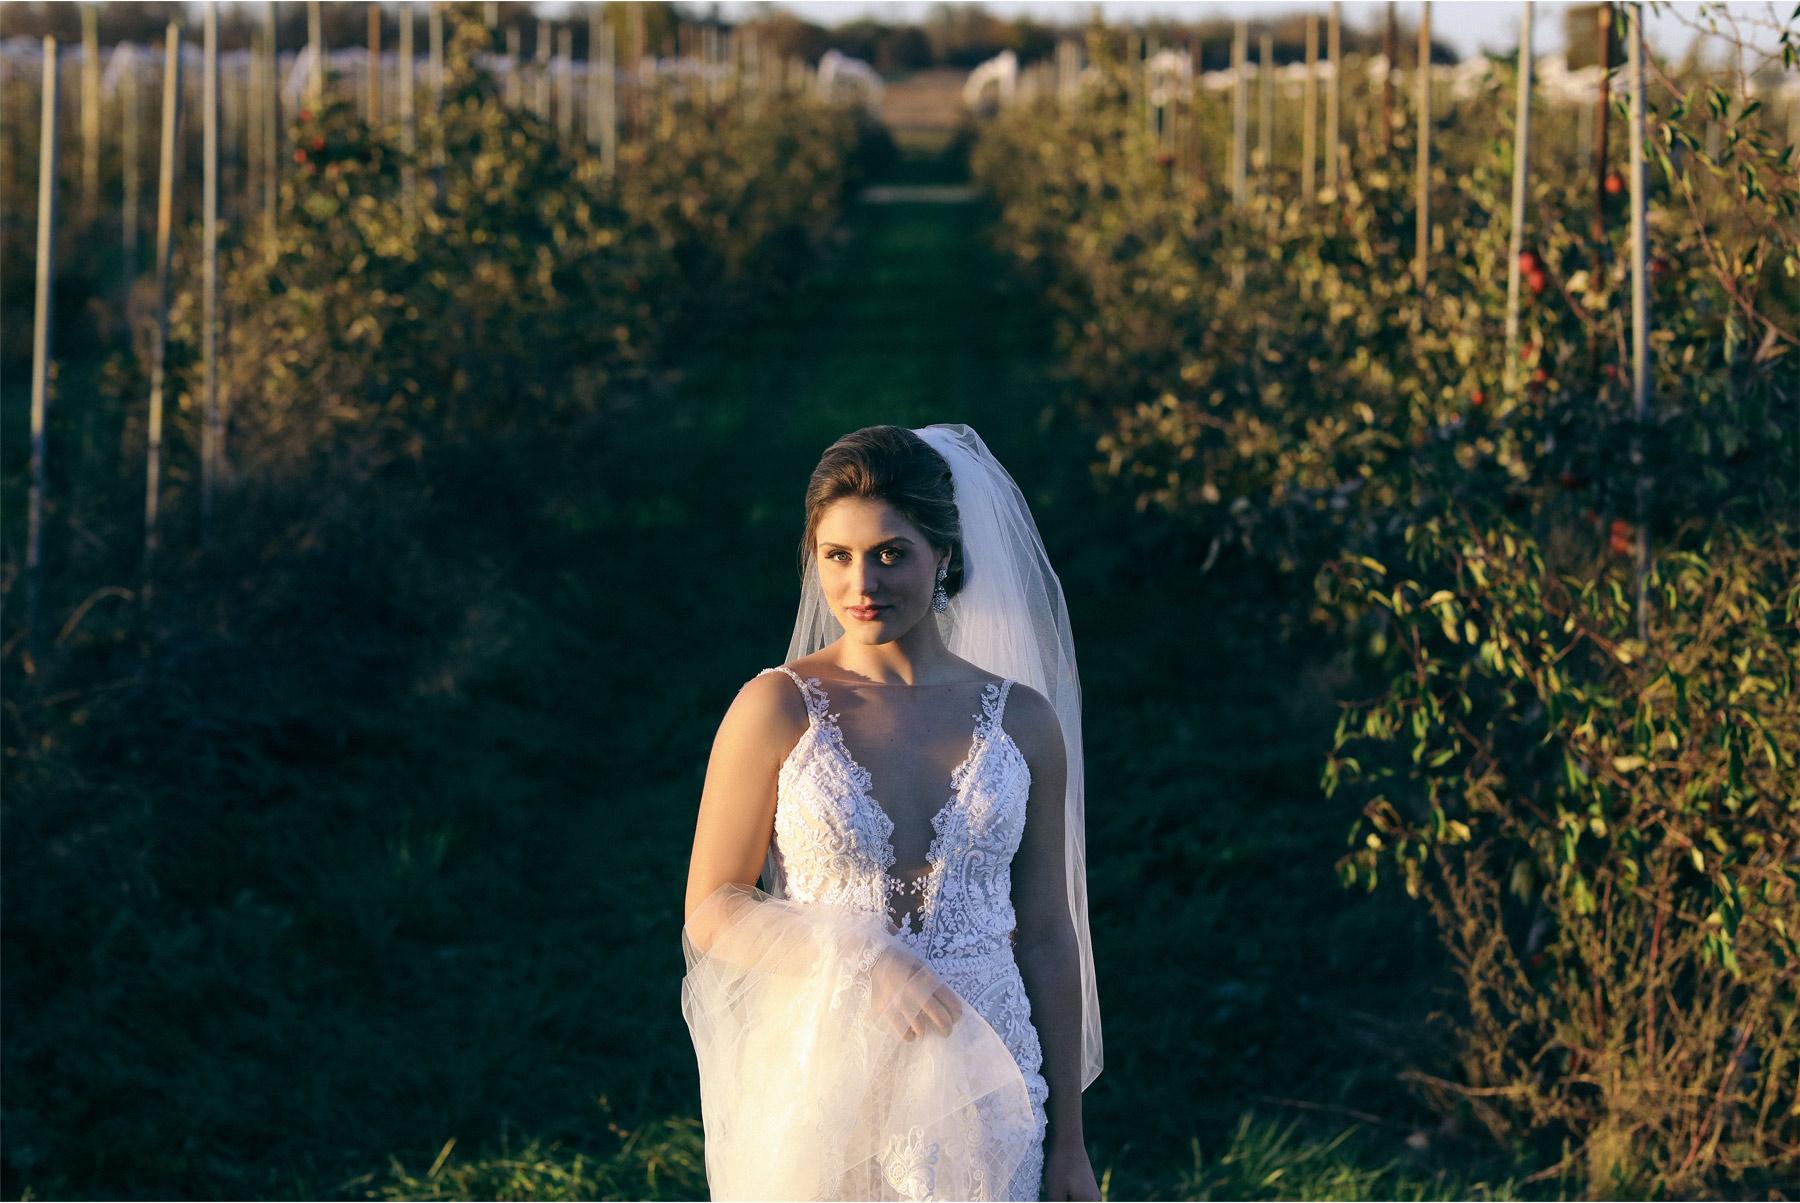 14-Ashery-Lane-Farm-Minneapolis-Minnesota-Wedding-Styled-Shoot-New-Venue-Barn-Orchard-Vineyard.jpg